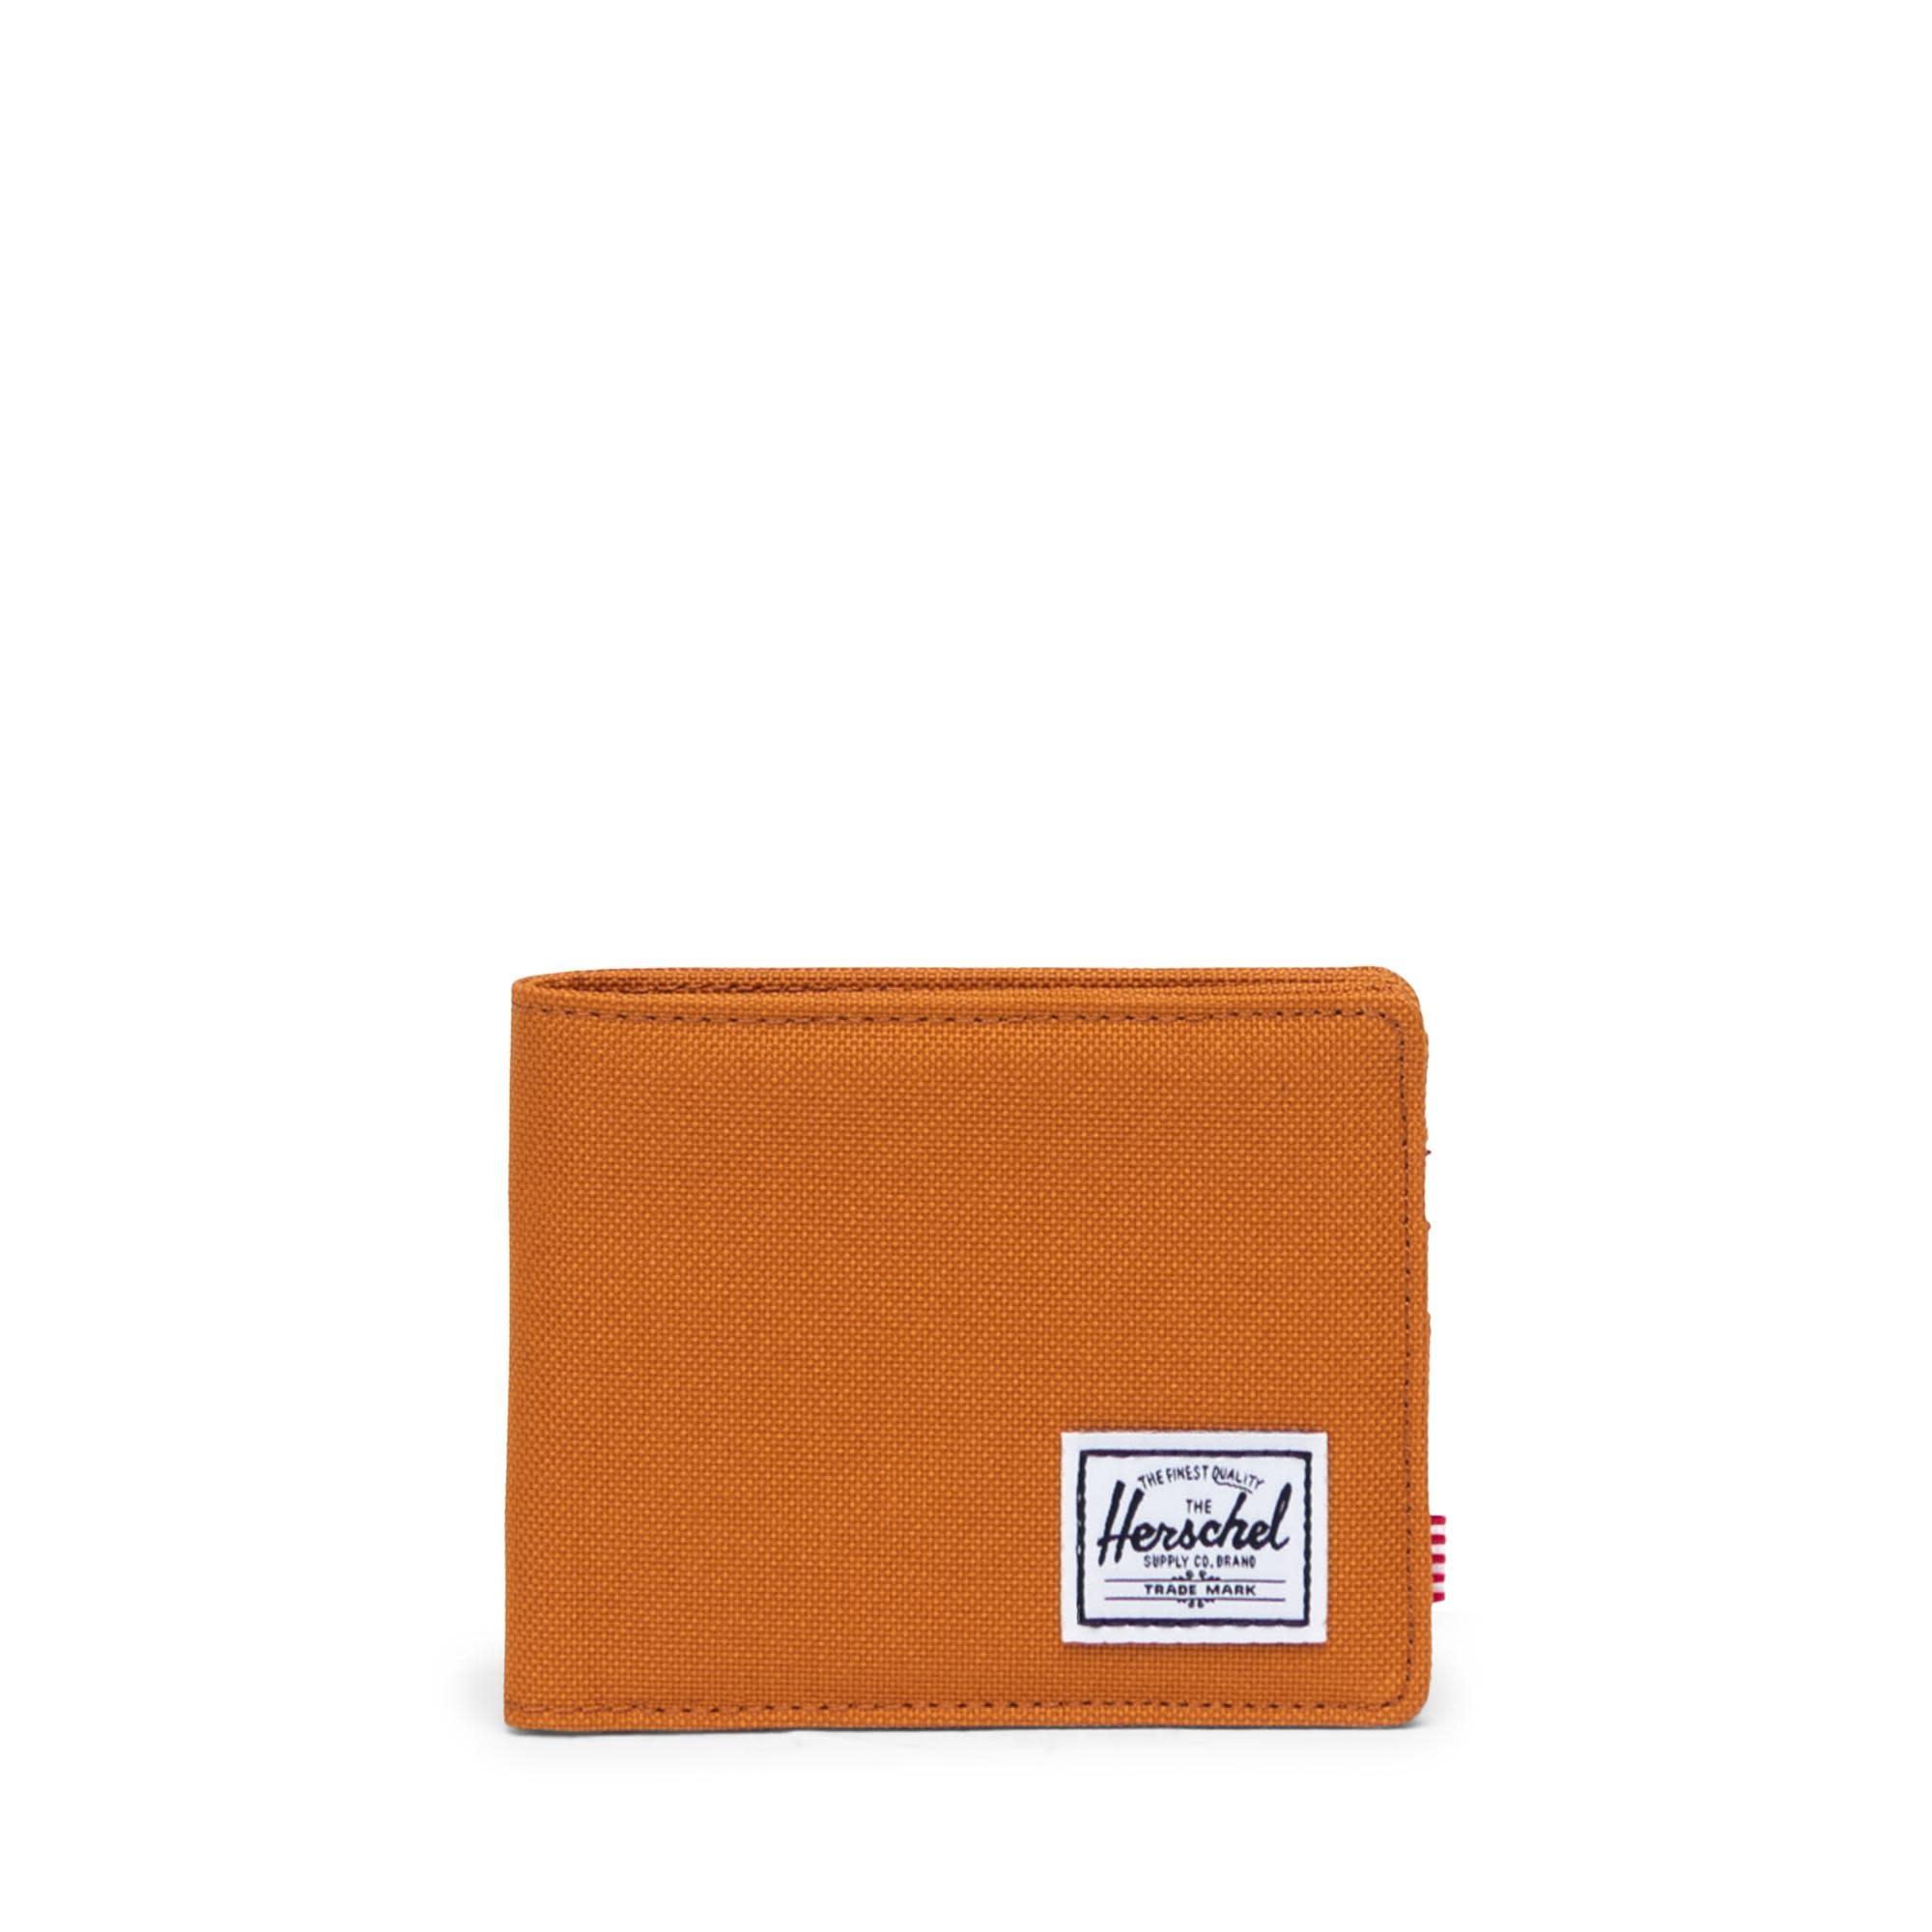 Herschel Supply Co. Herschel Roy Wallet - Pumpkin Spice